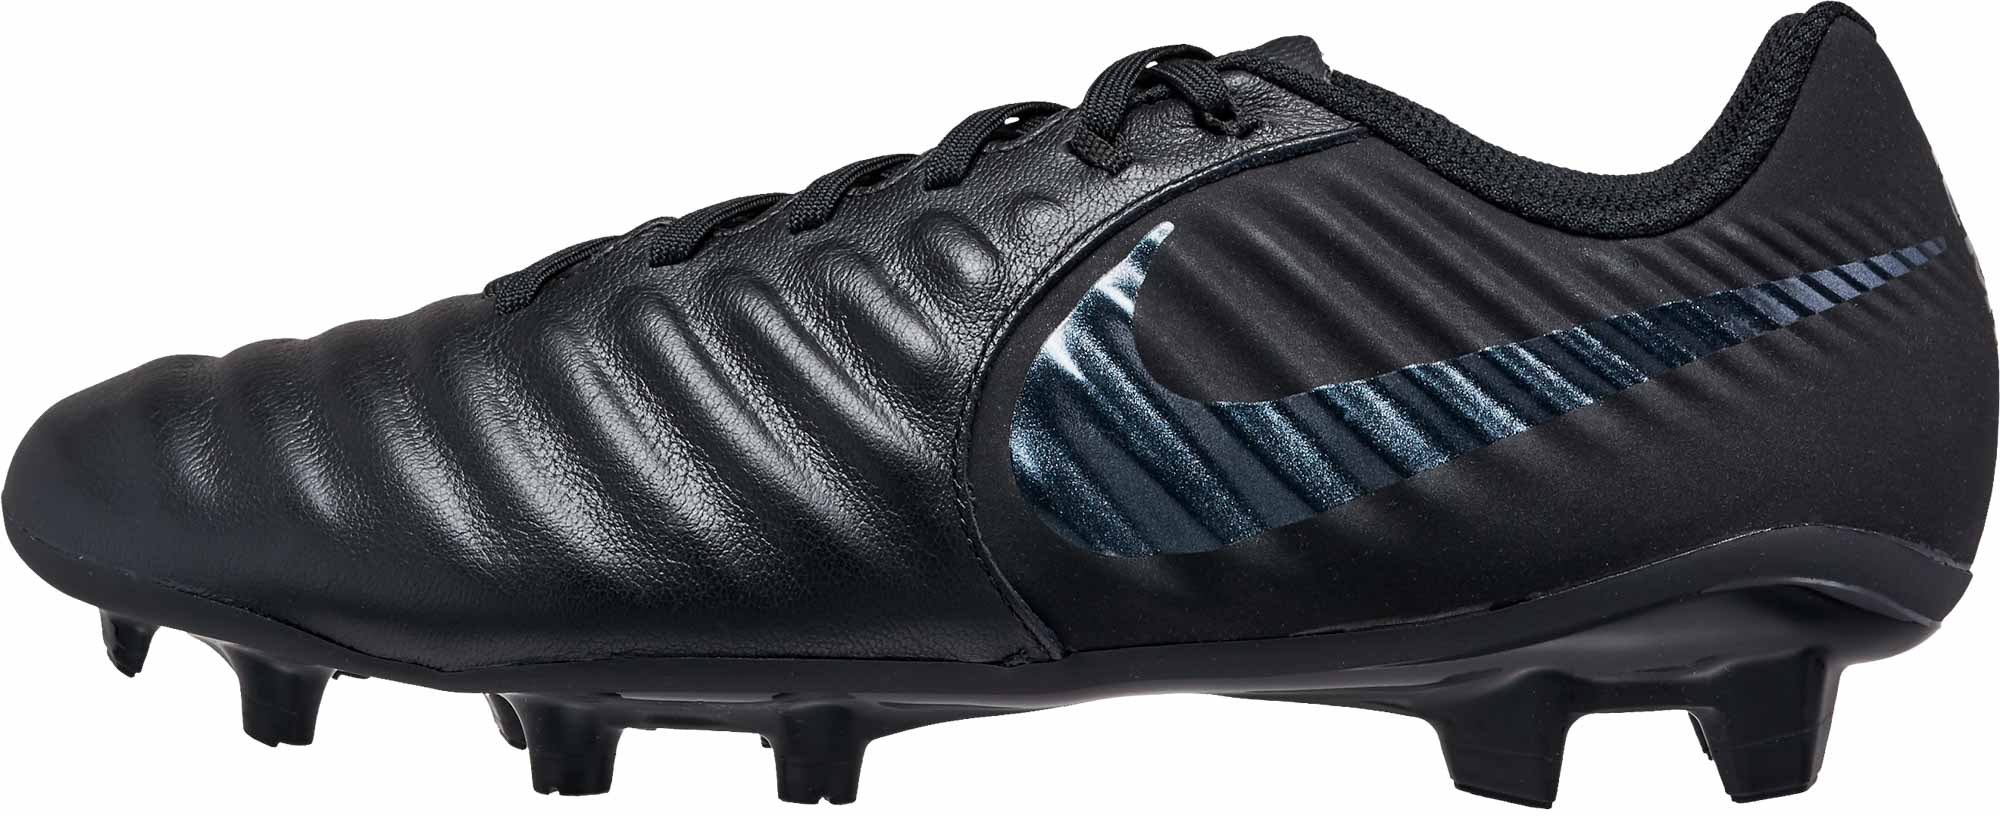 huge discount 53058 3222a Nike Tiempo Legend 7 Academy MG - Black/Black - Soccer Master